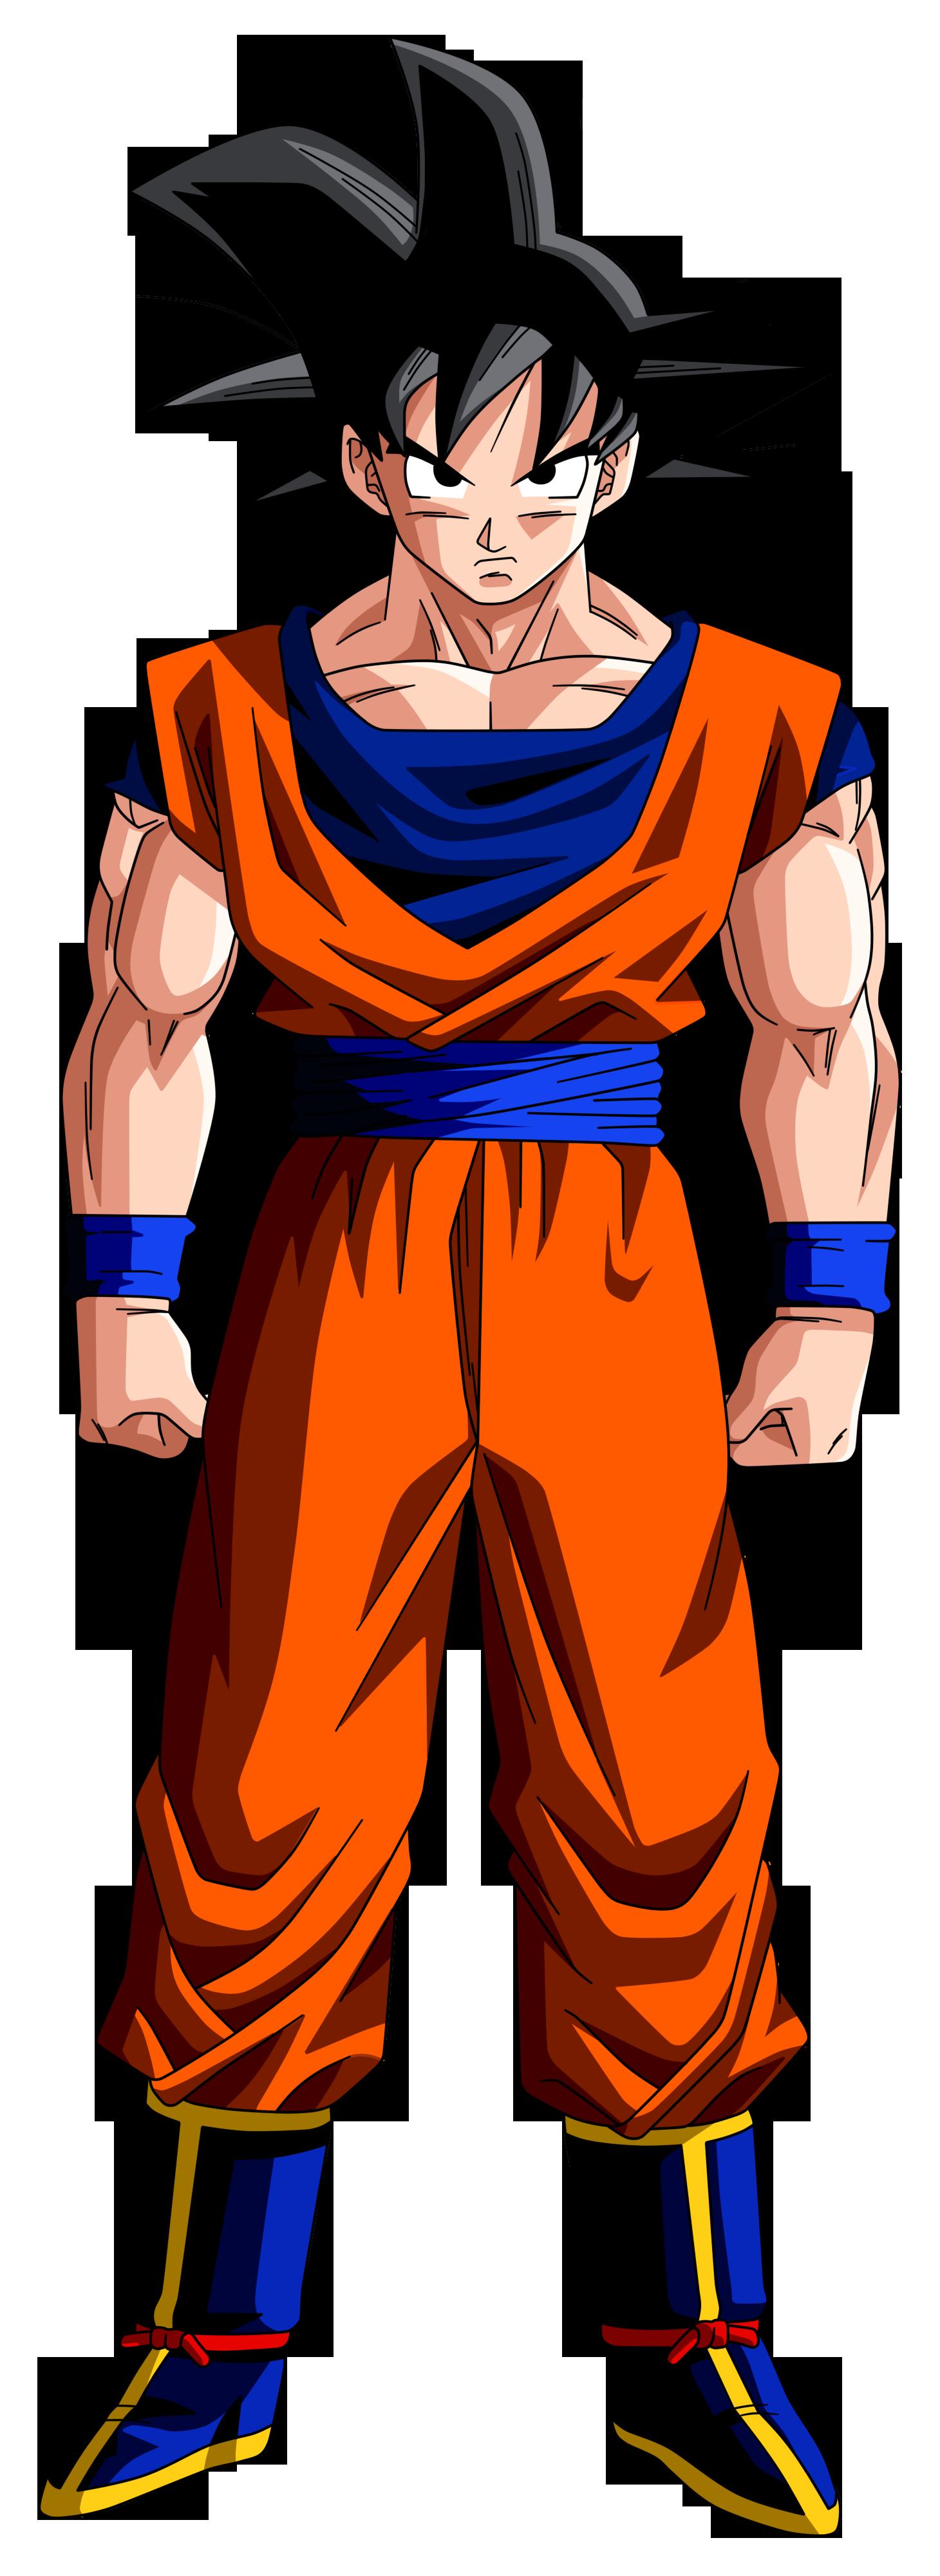 Goku (LordPanda)